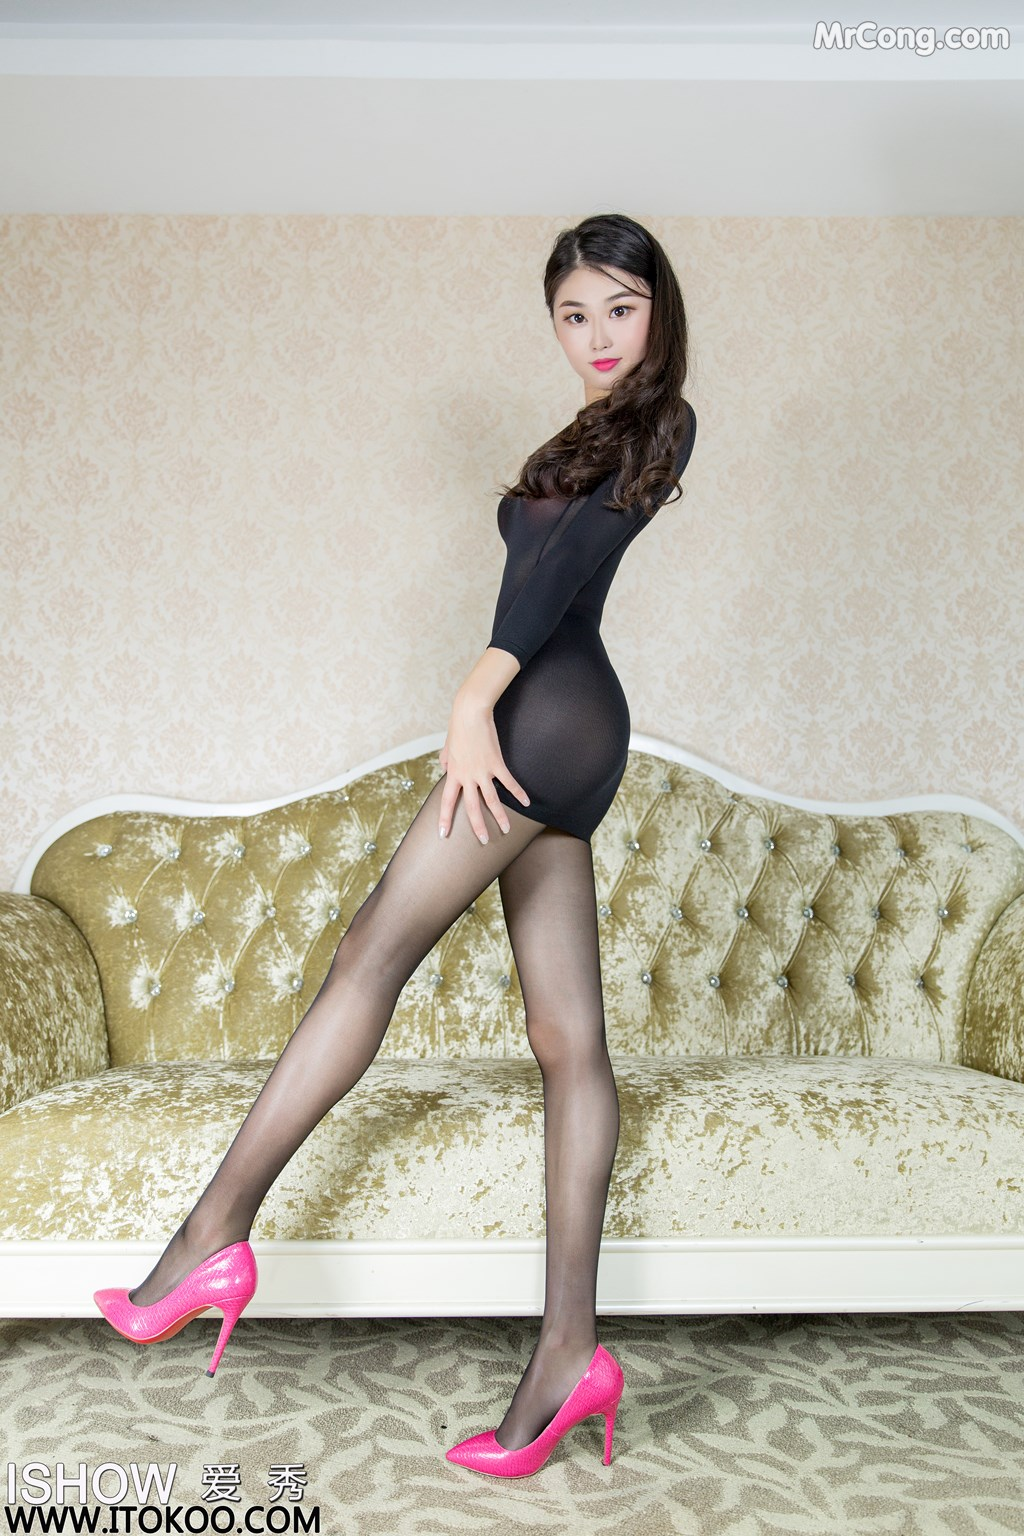 Image ISHOW-No.147-Liu-Yue-Fei-Phoebe-MrCong.com-003 in post ISHOW No.147: Người mẫu Liu Yue Fei (刘玥菲Phoebe) (33 ảnh)